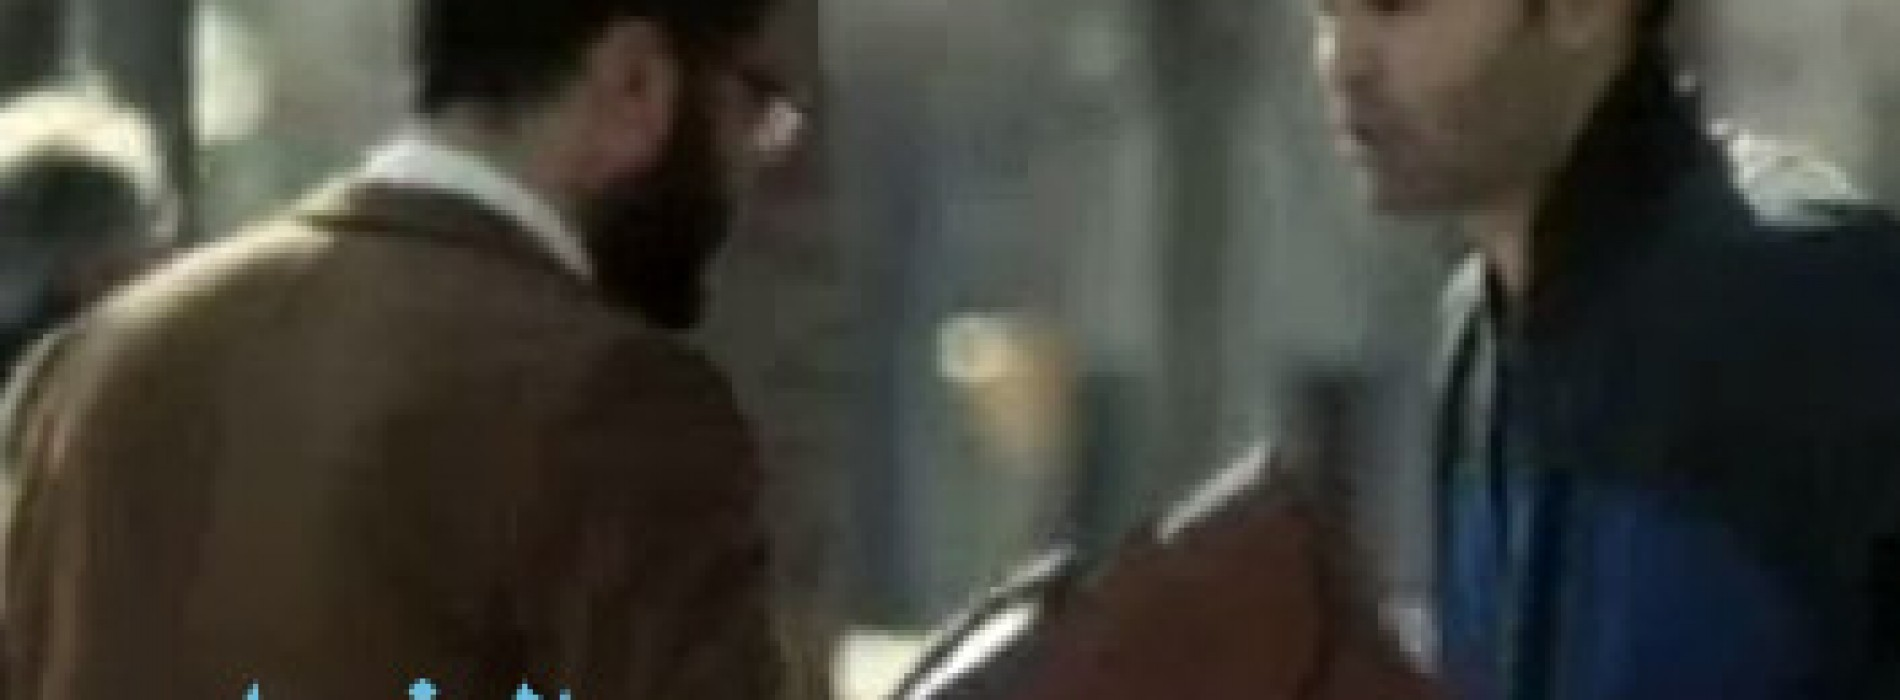 YOUTUBE – كاميرا خفيه – انيستا وكاسياس ينزلون للشارع يطلبون توقيع وصورة من الناس :D